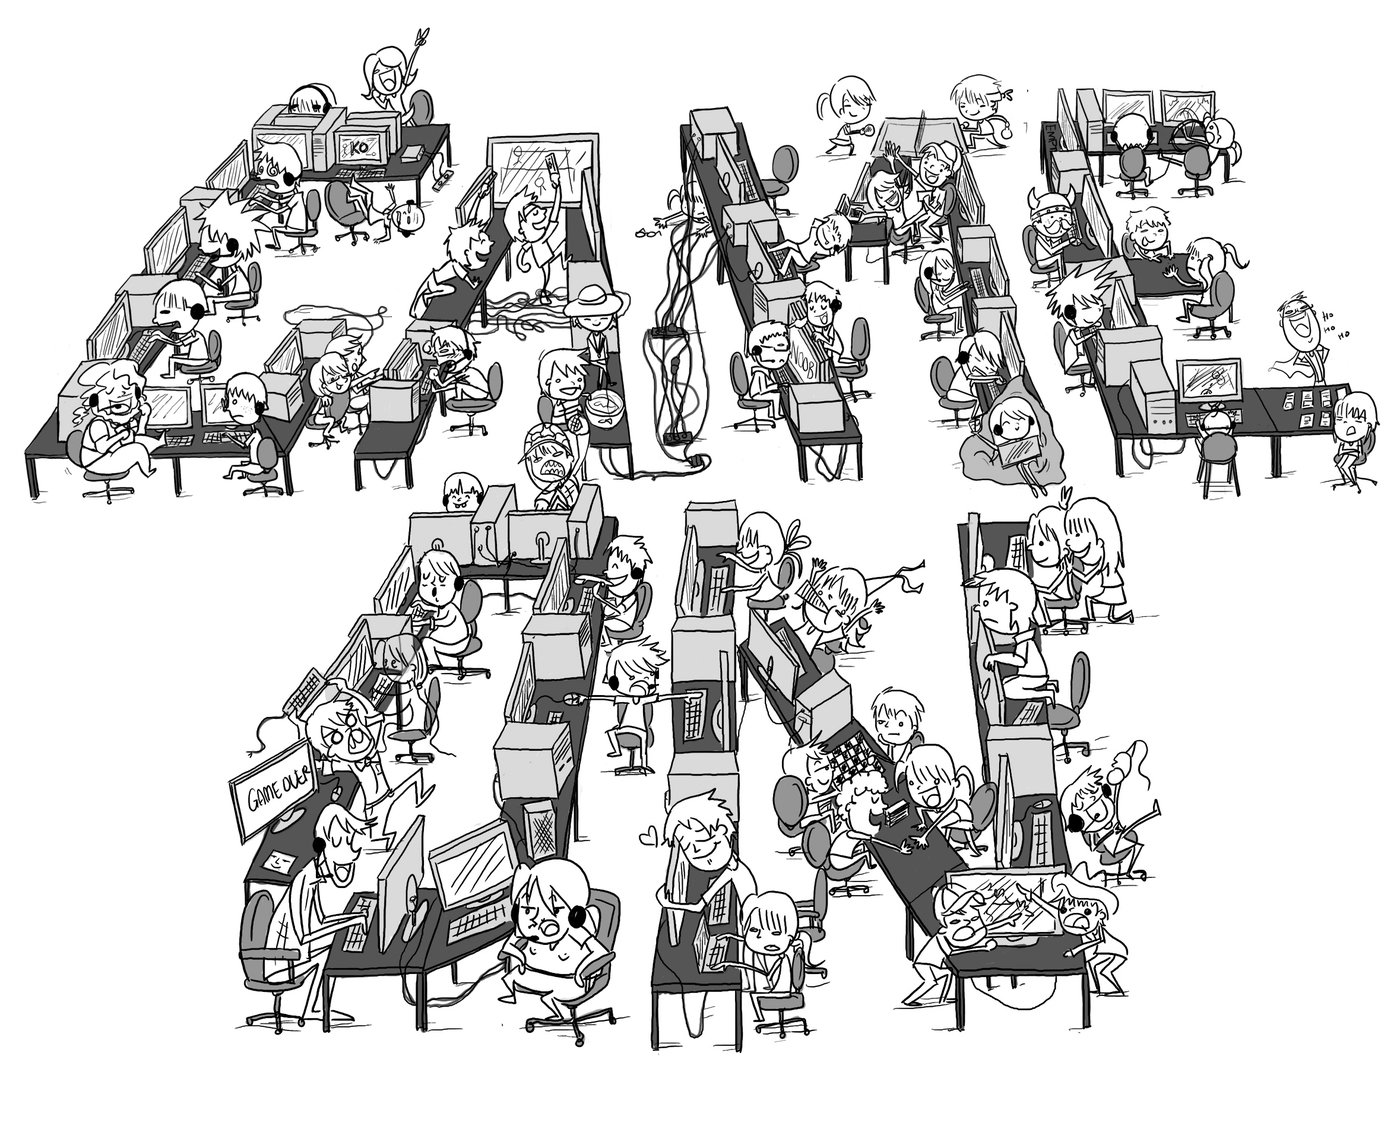 Illustration by Madeleine L at Coroflot.com